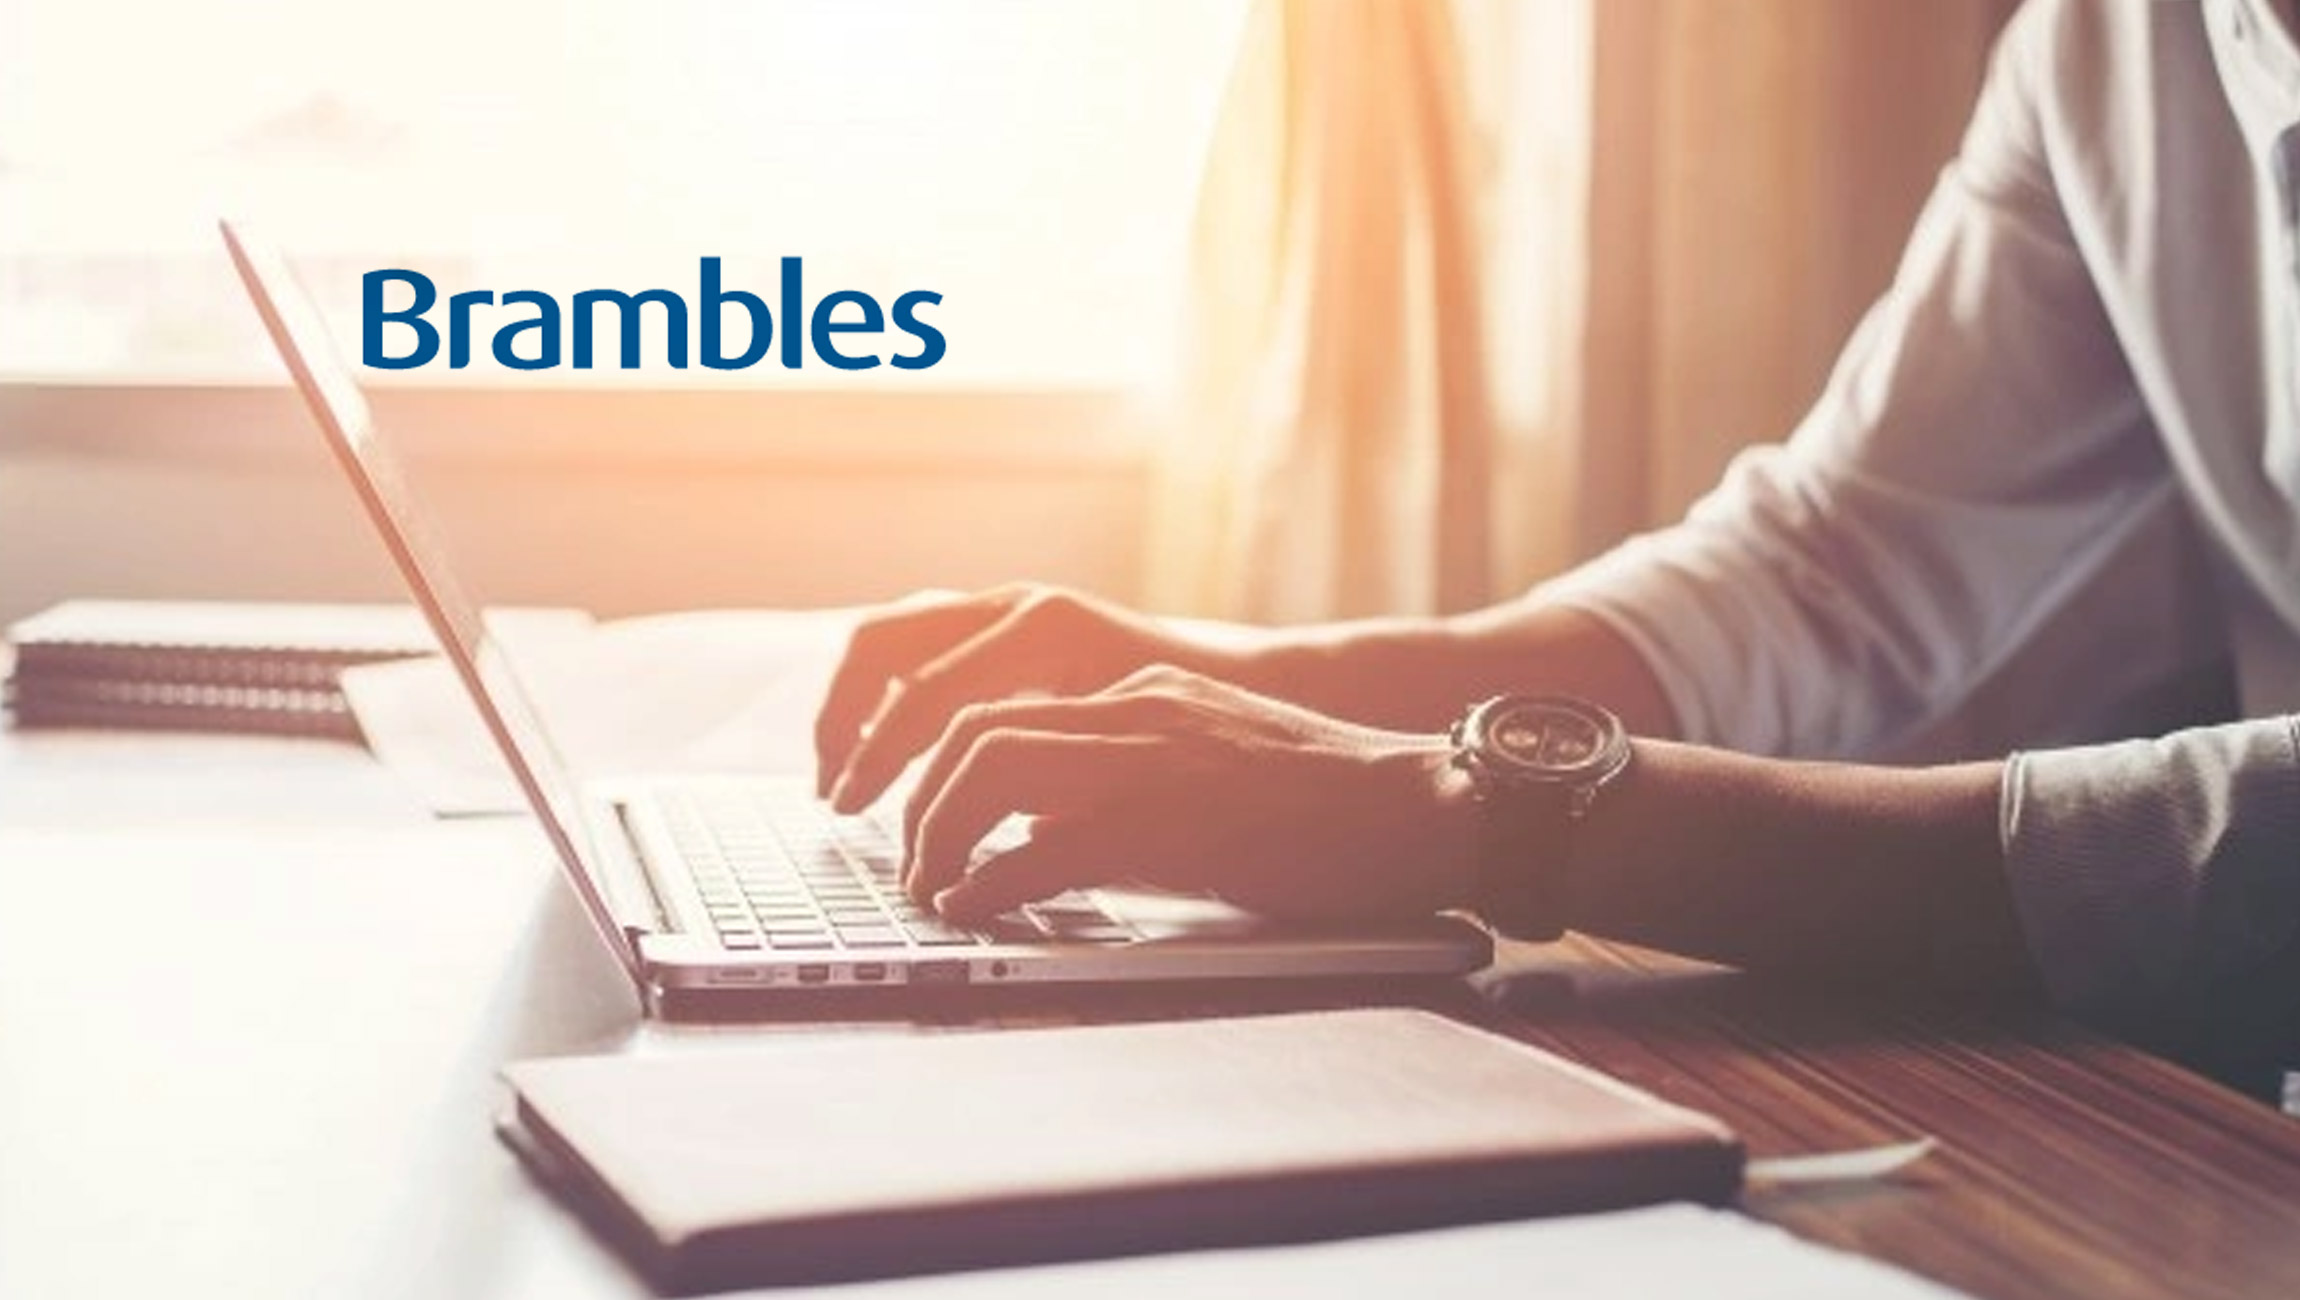 Brambles-Becomes-a-Carbon-Neutral-Operations-Company